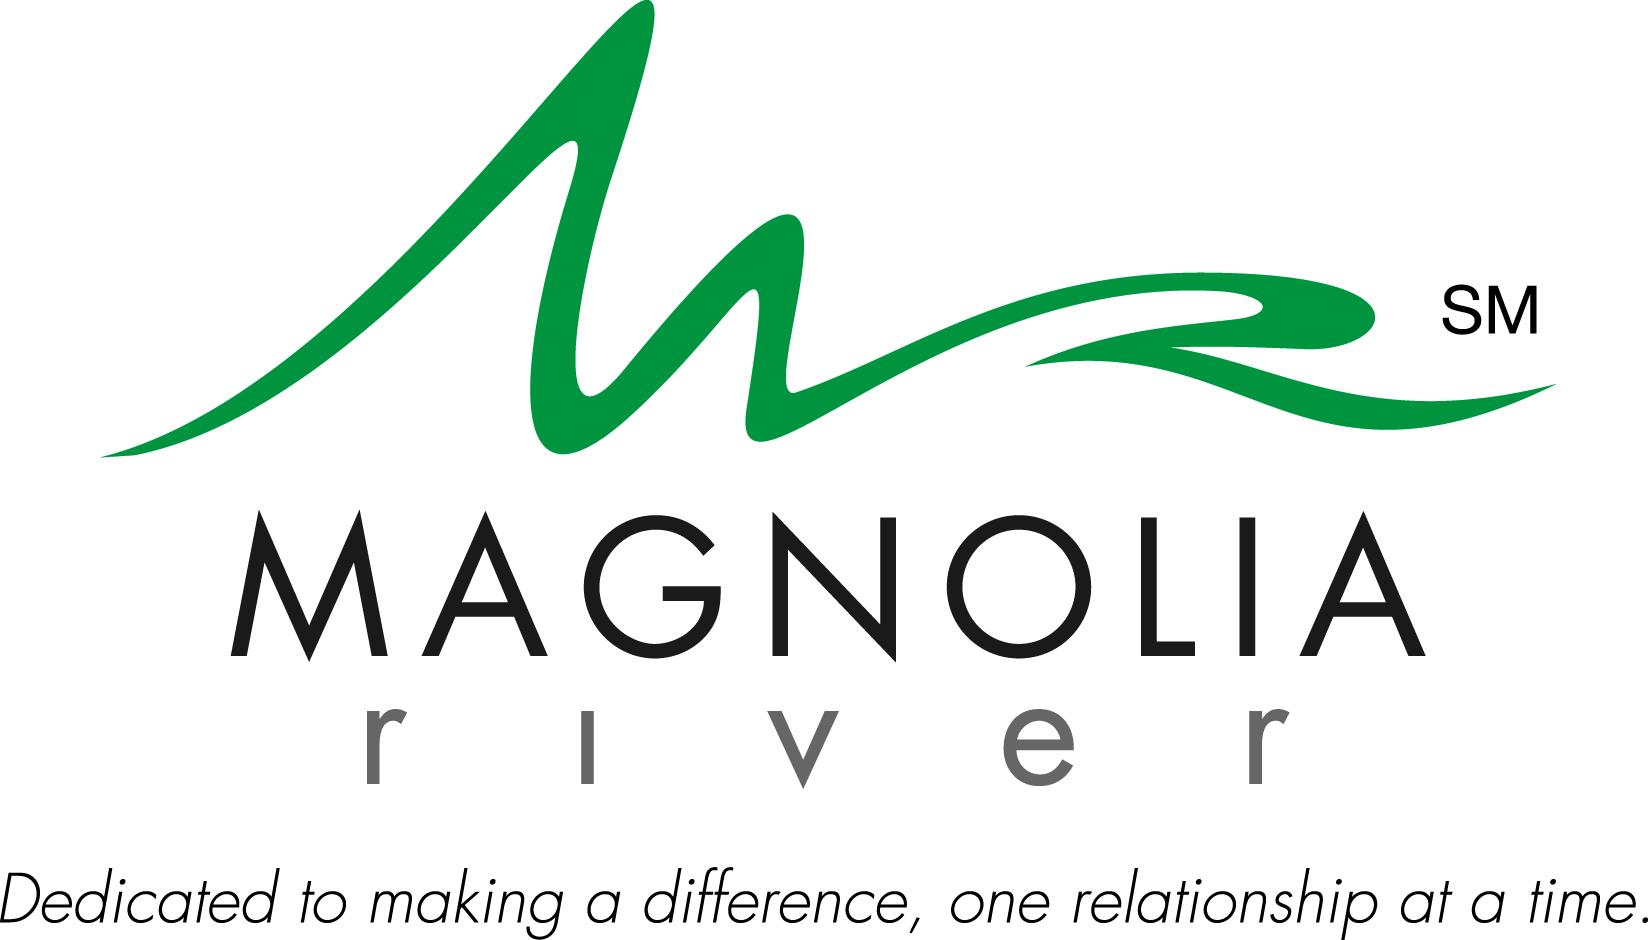 Magnolia River_Logo_Making_A_Difference_600dpi.jpg